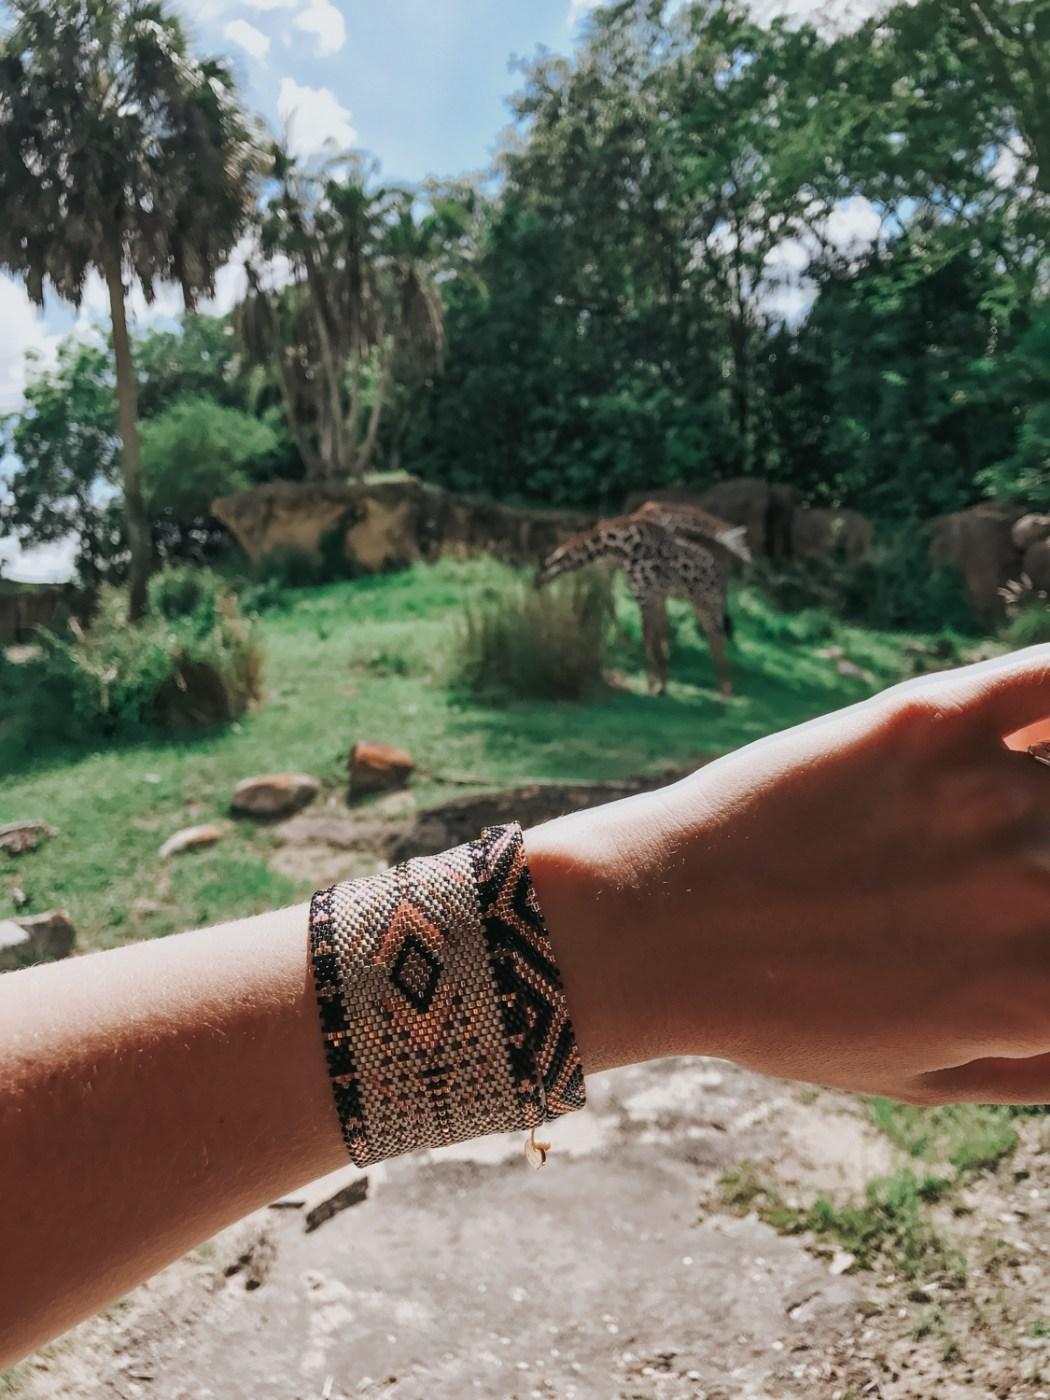 Showing off my @kutulakiss bracelets during the Kilimanjaro Safari at Animal Kingdom